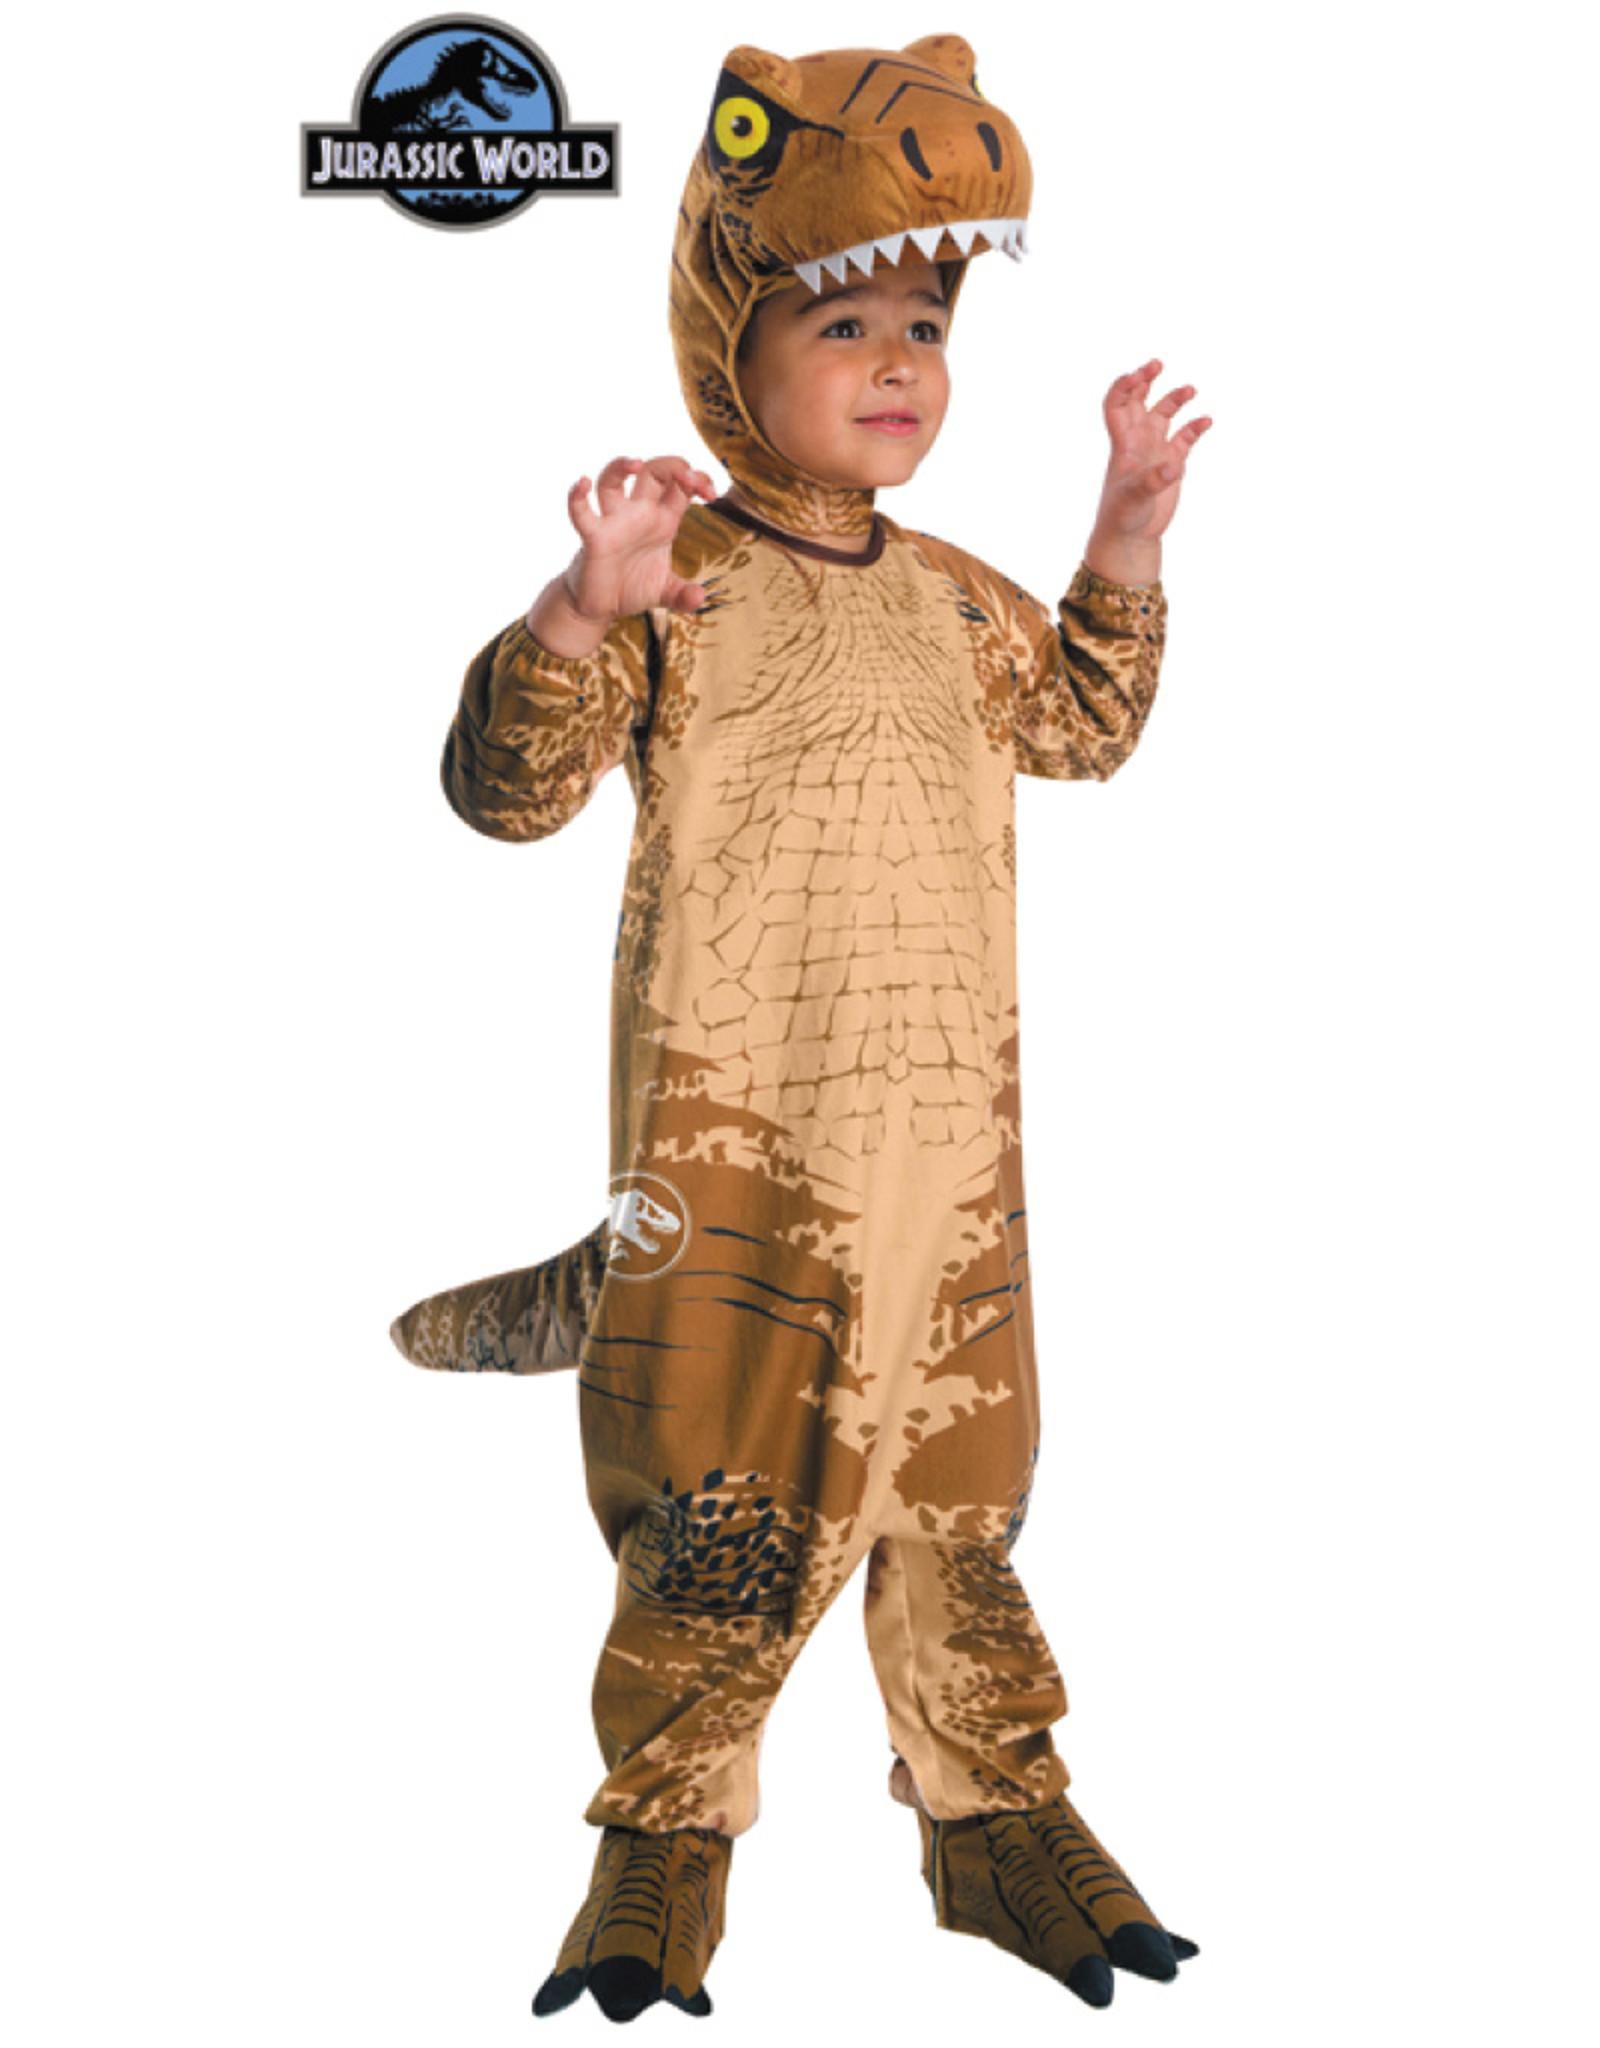 Jurassic World 2 T-Rex - Toddler